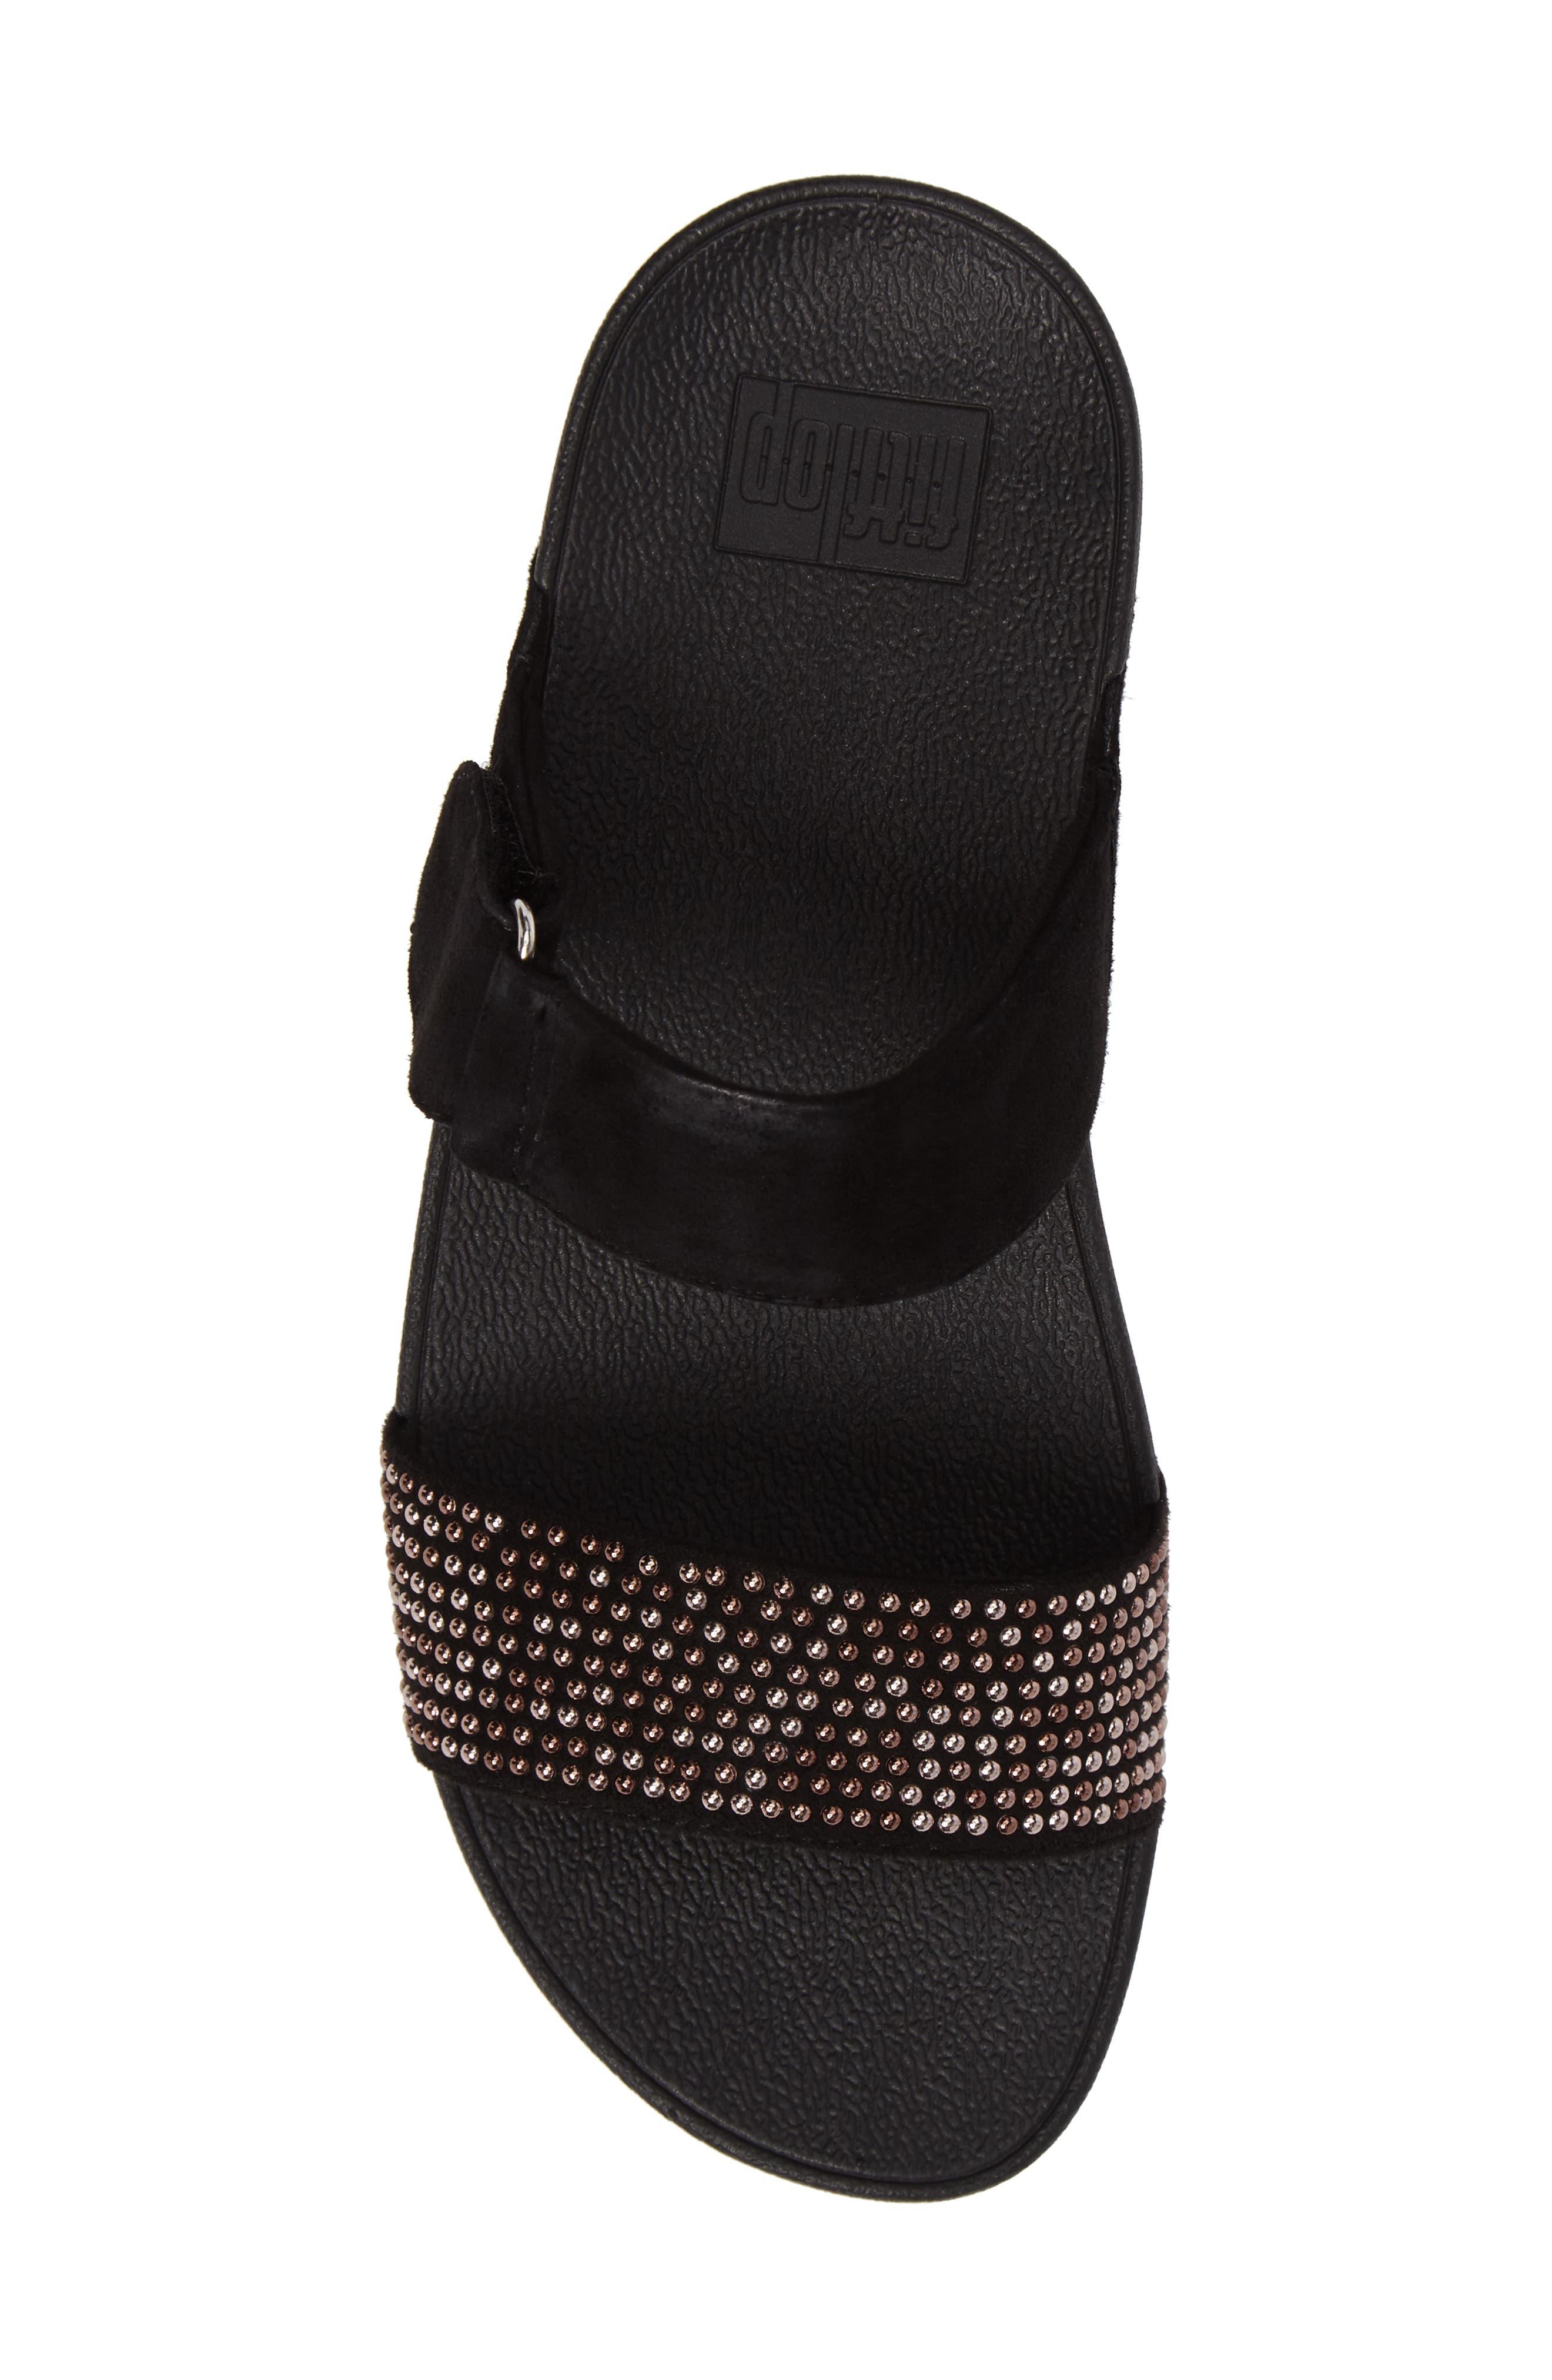 Lulu Popstud Wedge Slide Sandal,                             Alternate thumbnail 5, color,                             Black Fabric